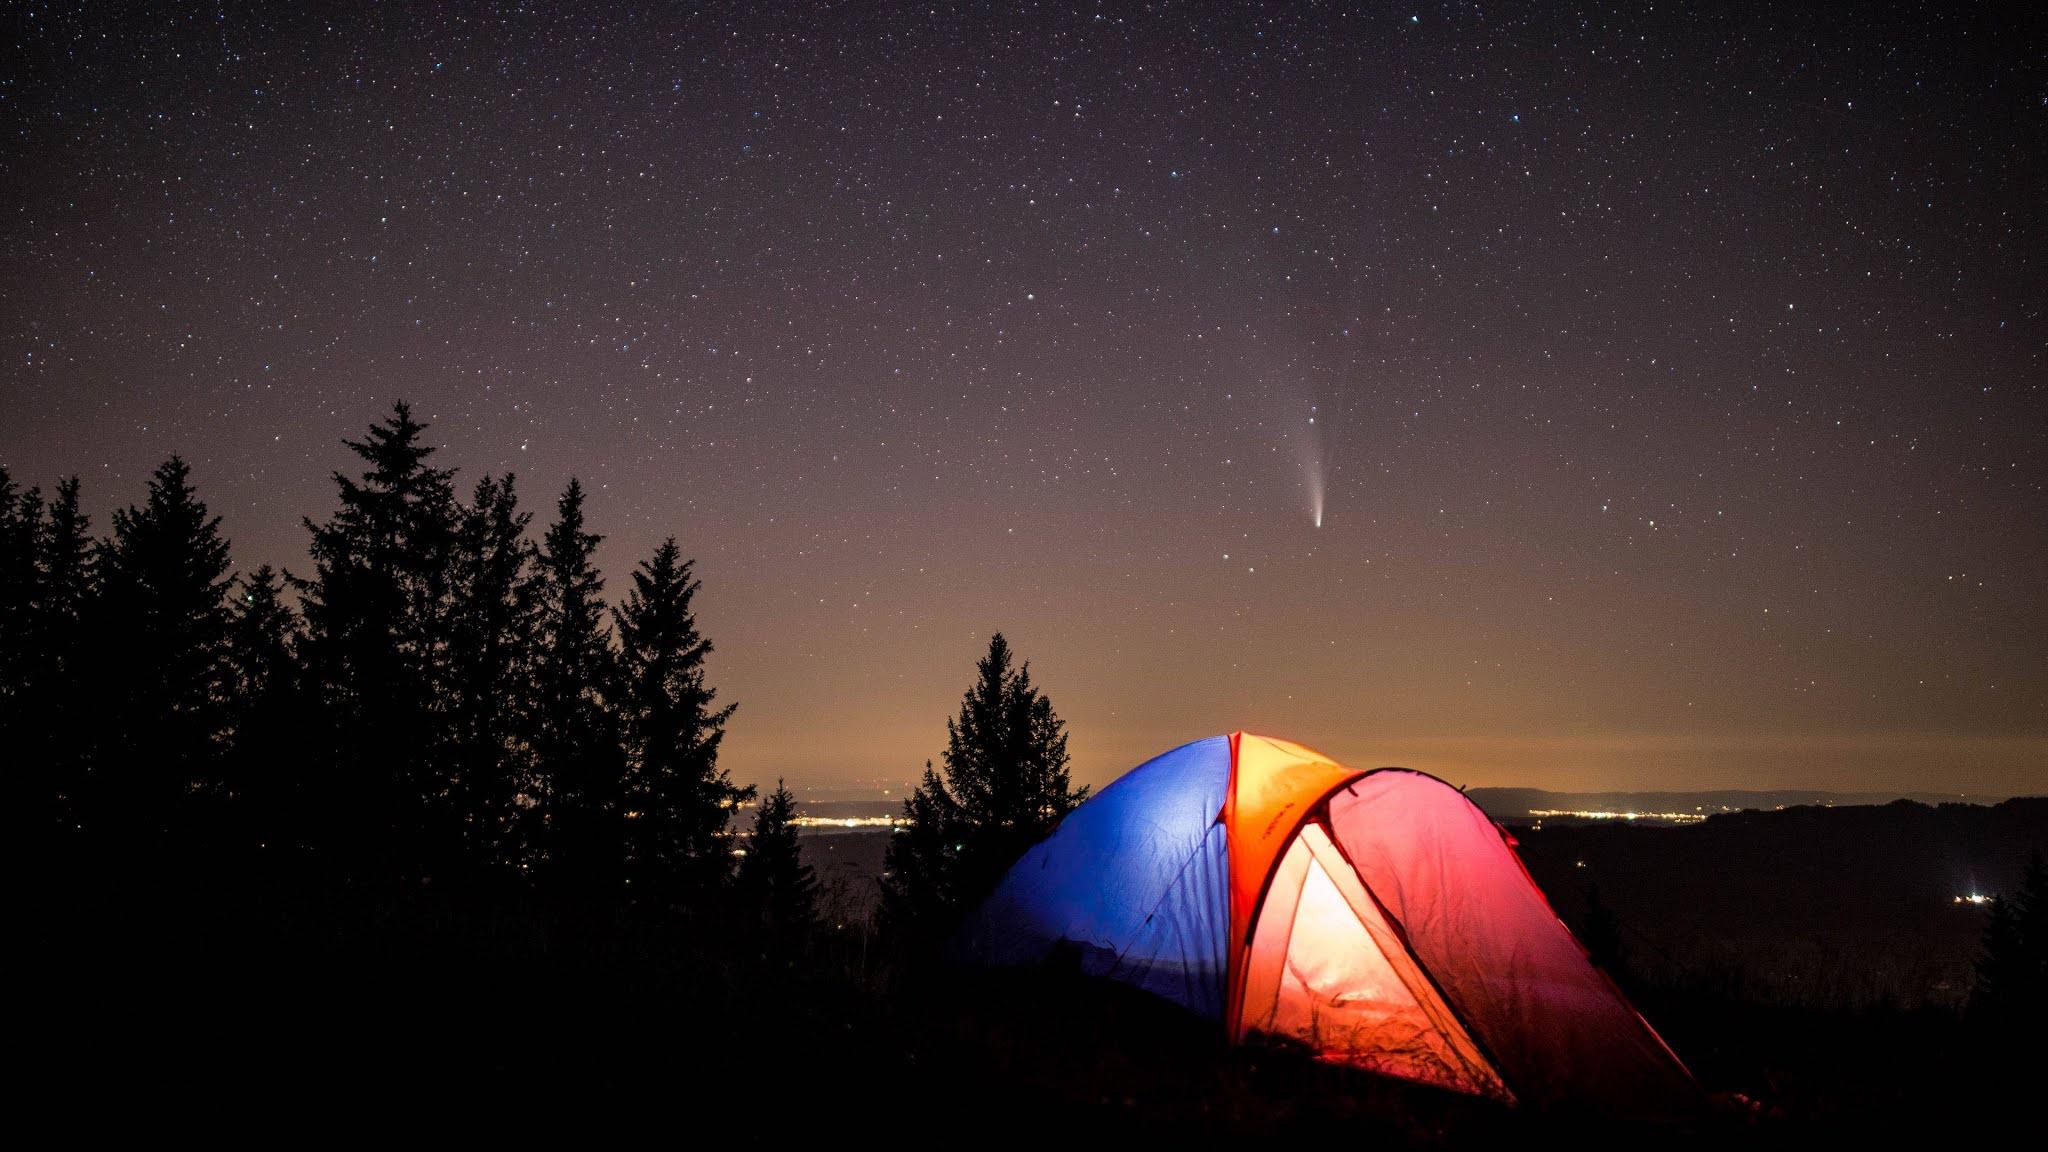 Tent, Camping, Comet, Night Starry Sky